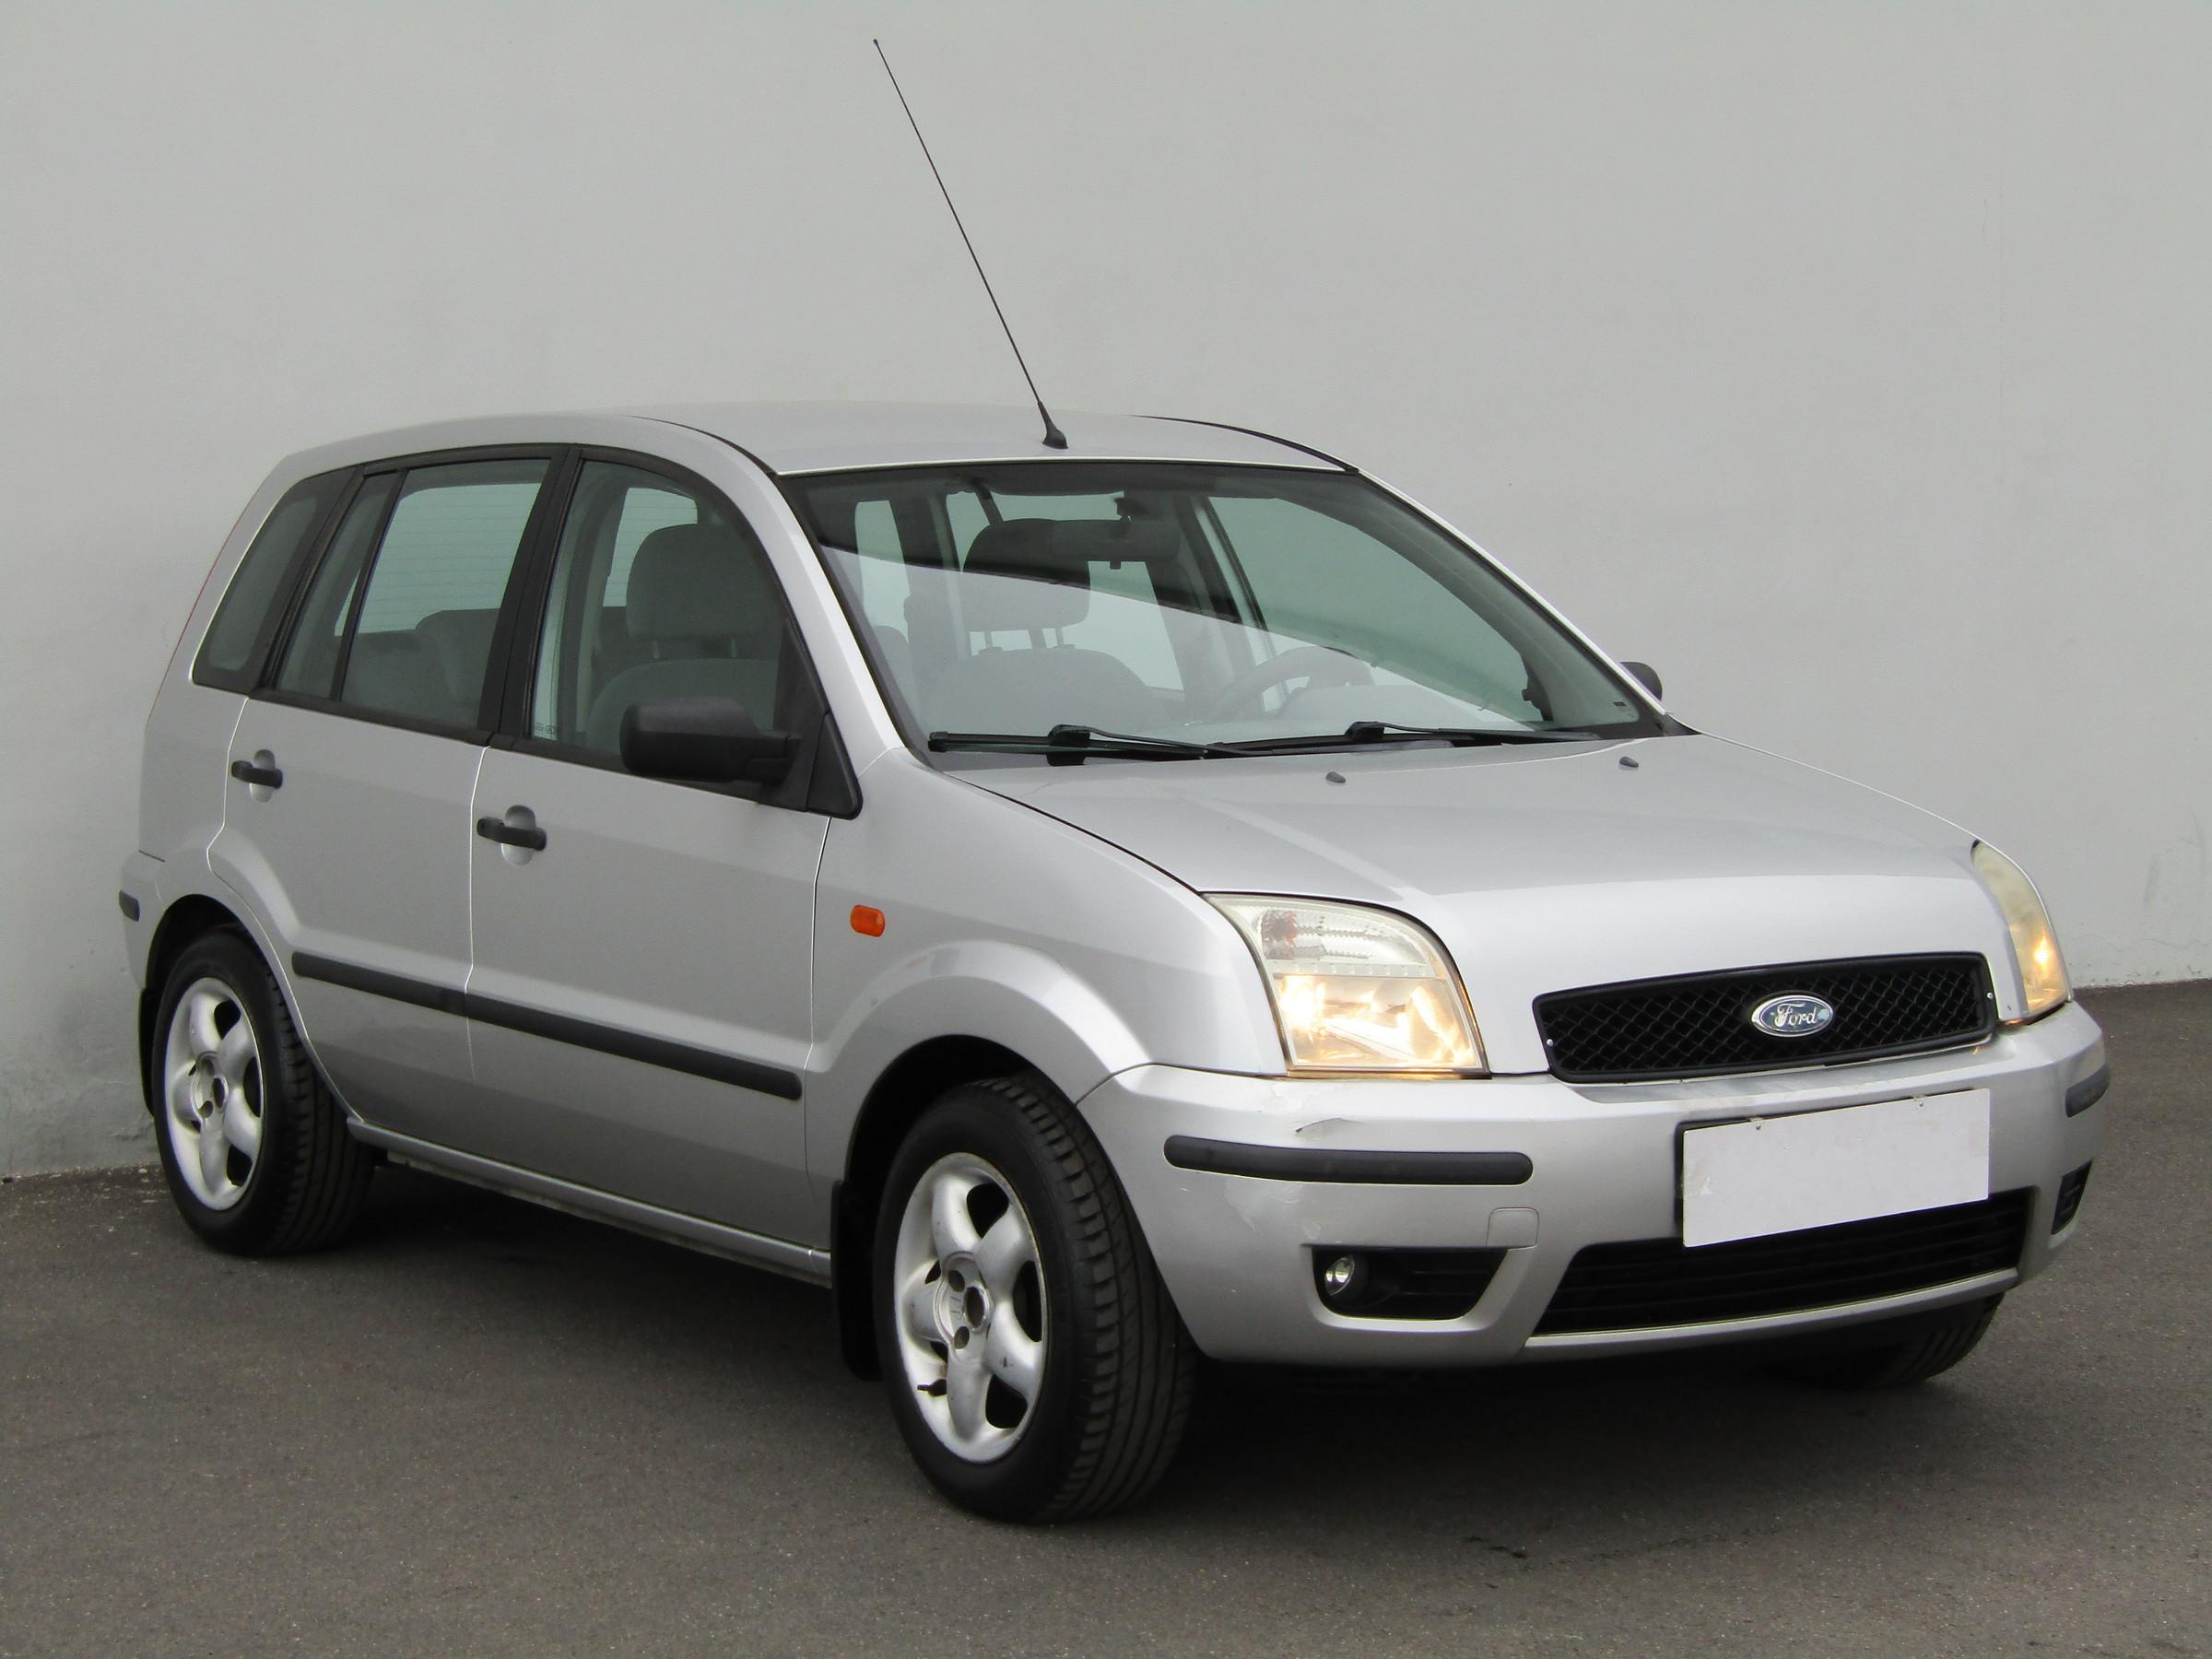 Ford Fusion 1.4 16V